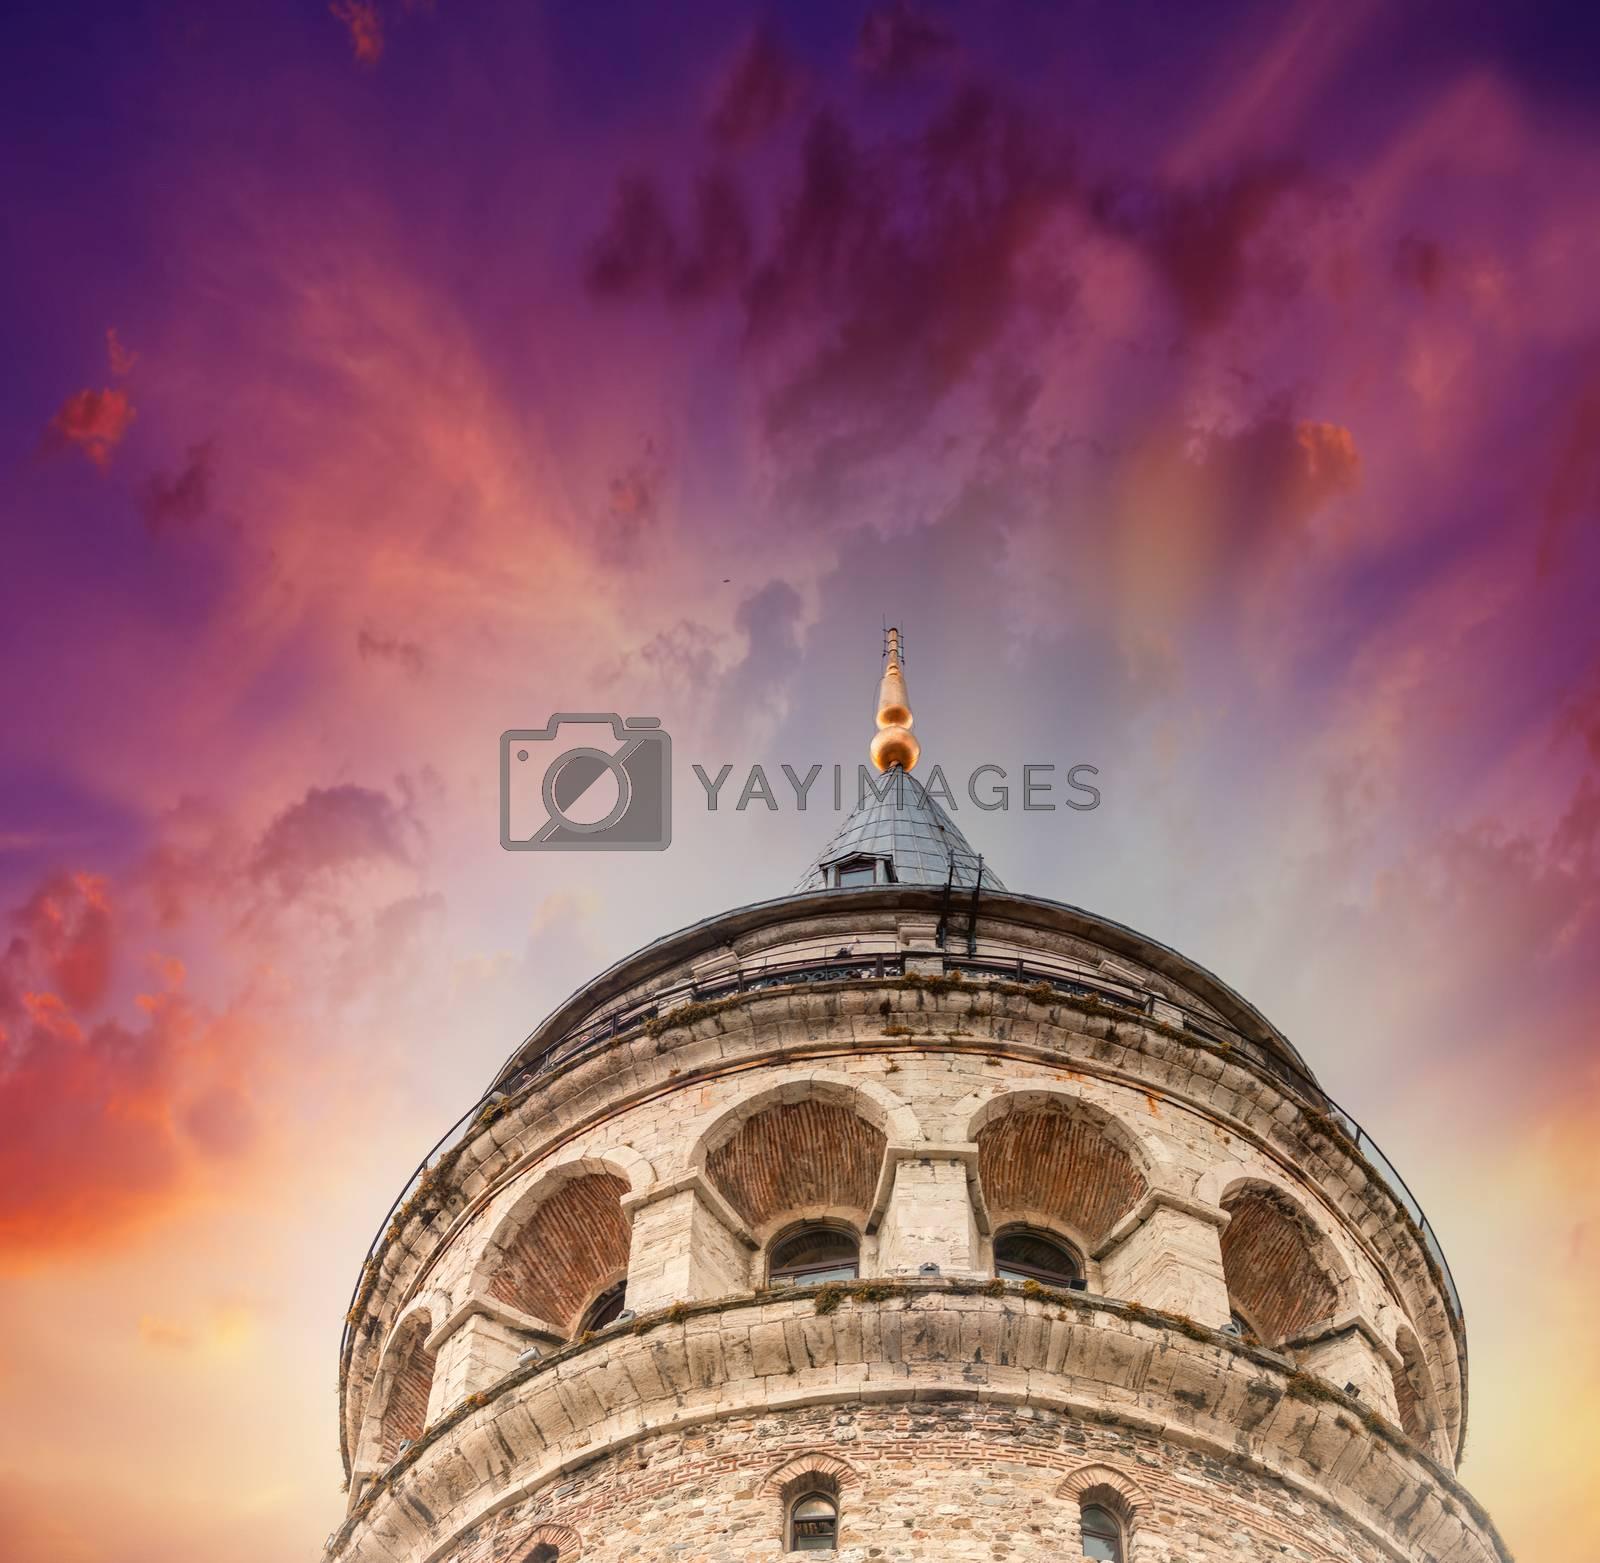 The Galata Tower, ancient building in Beyoglu, Istanbul - Turkey.